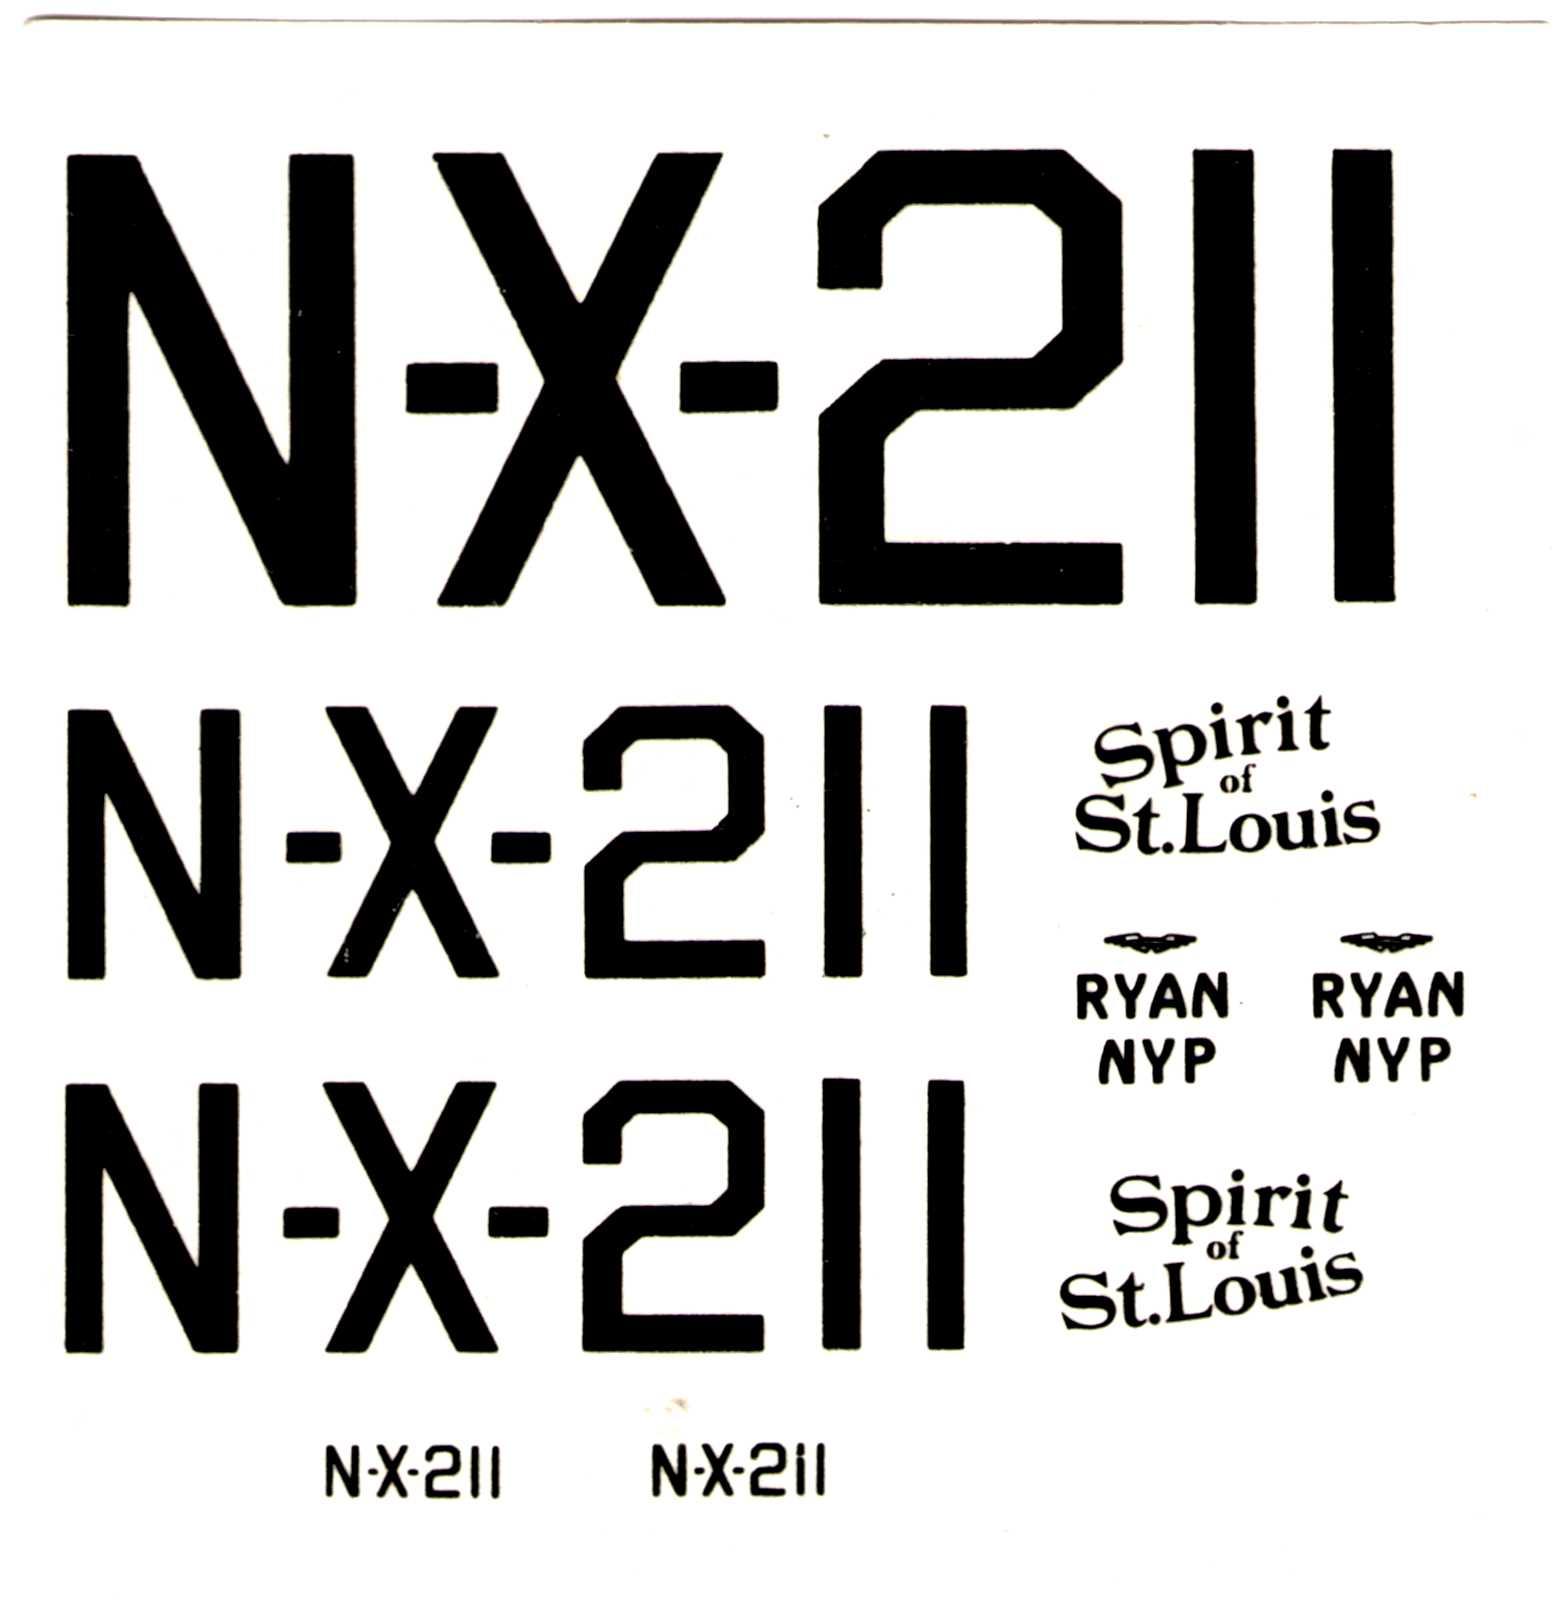 Декаль NOVO Toys Ltd F166 Ryan - Spirit of St. Louis 1/72